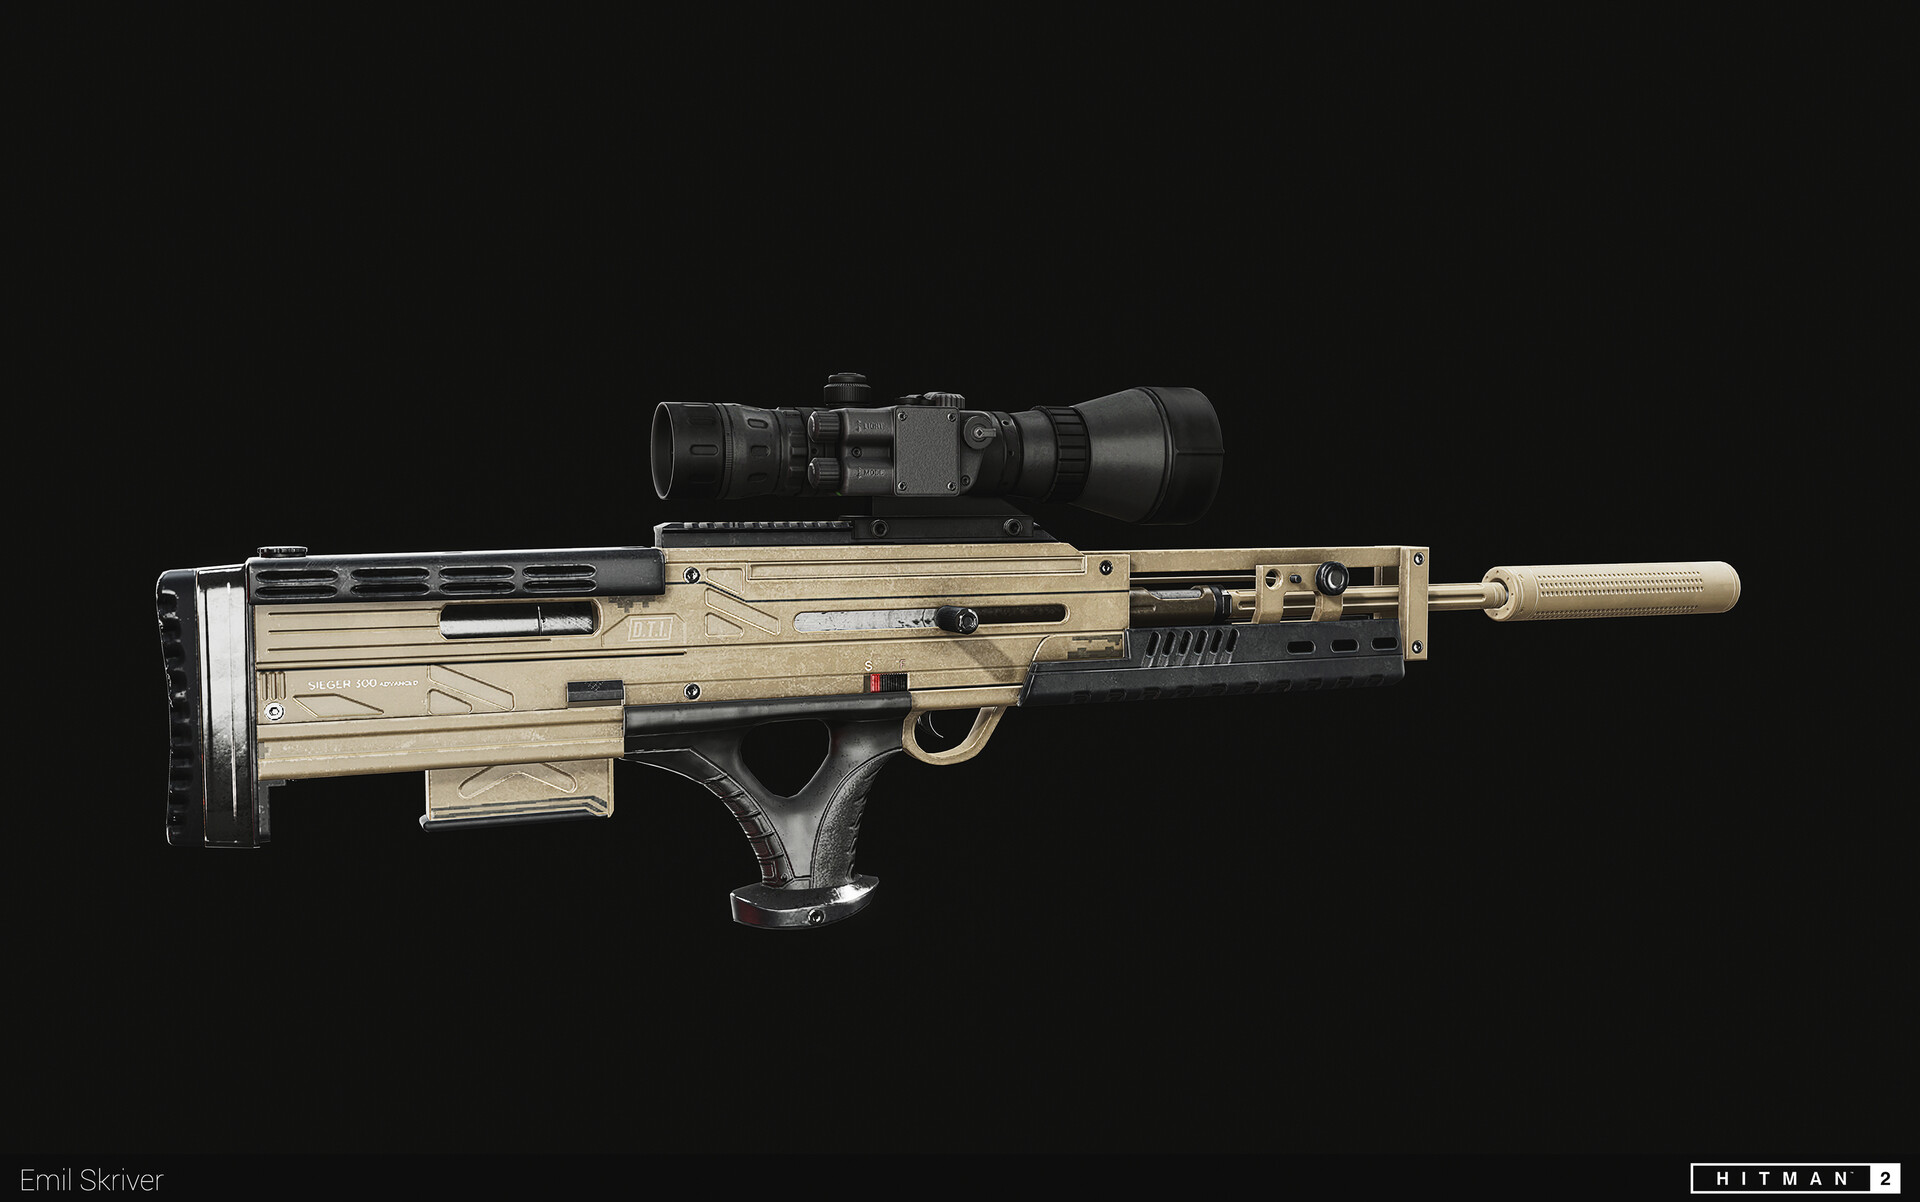 Sieger sniper rifle